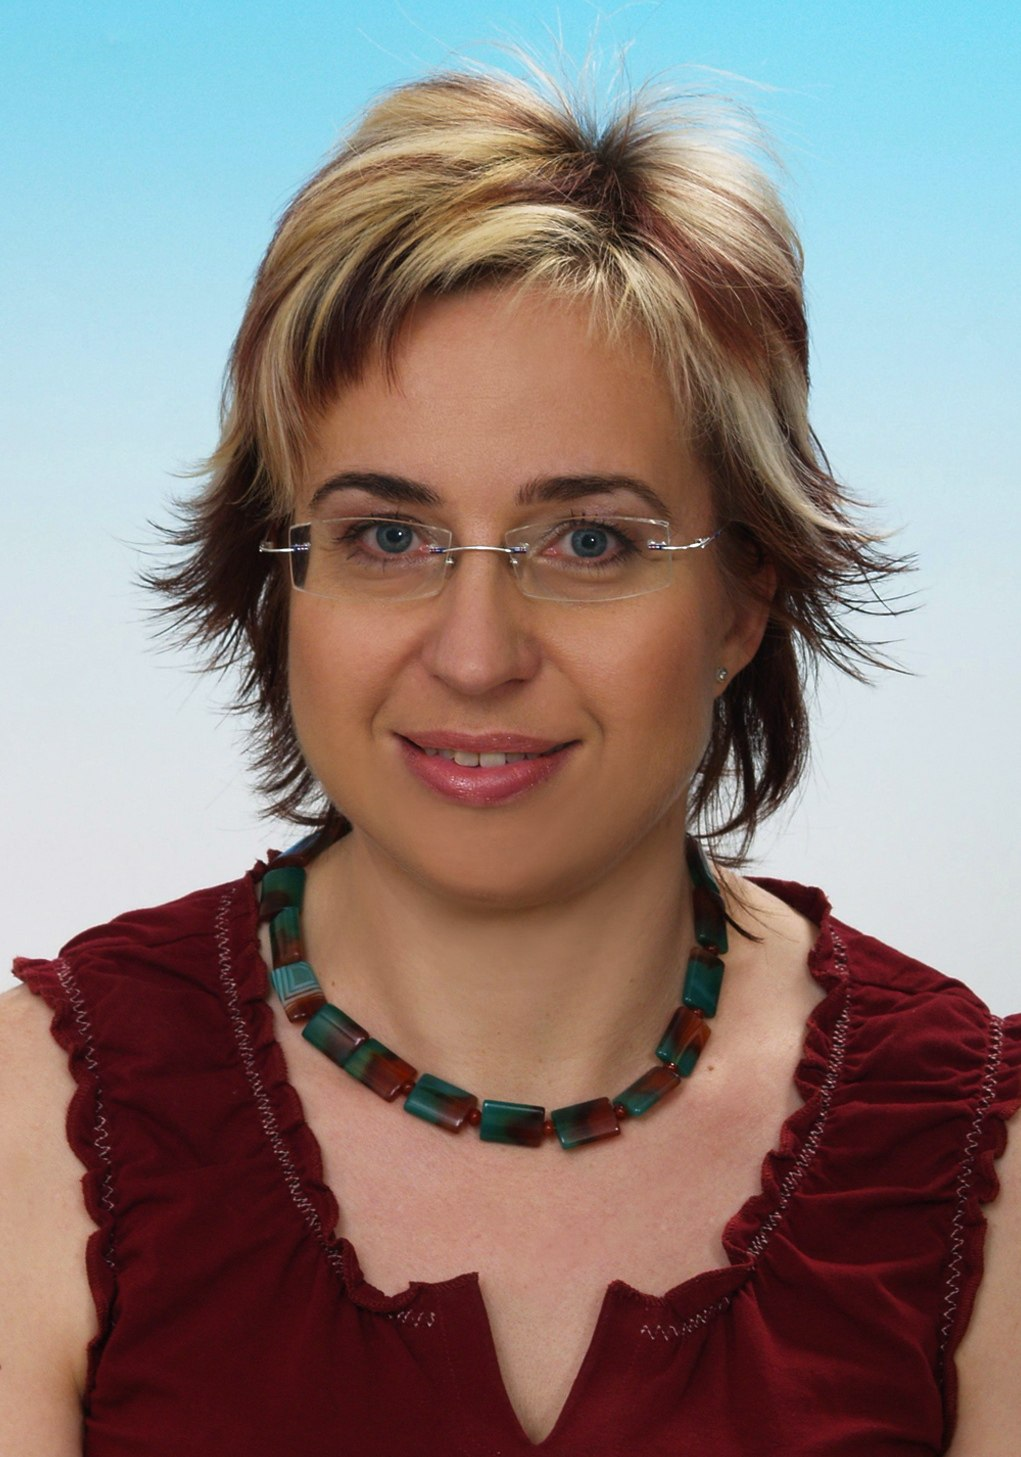 MUDr. PhDr. Zdeňka Nováková Ph.D.